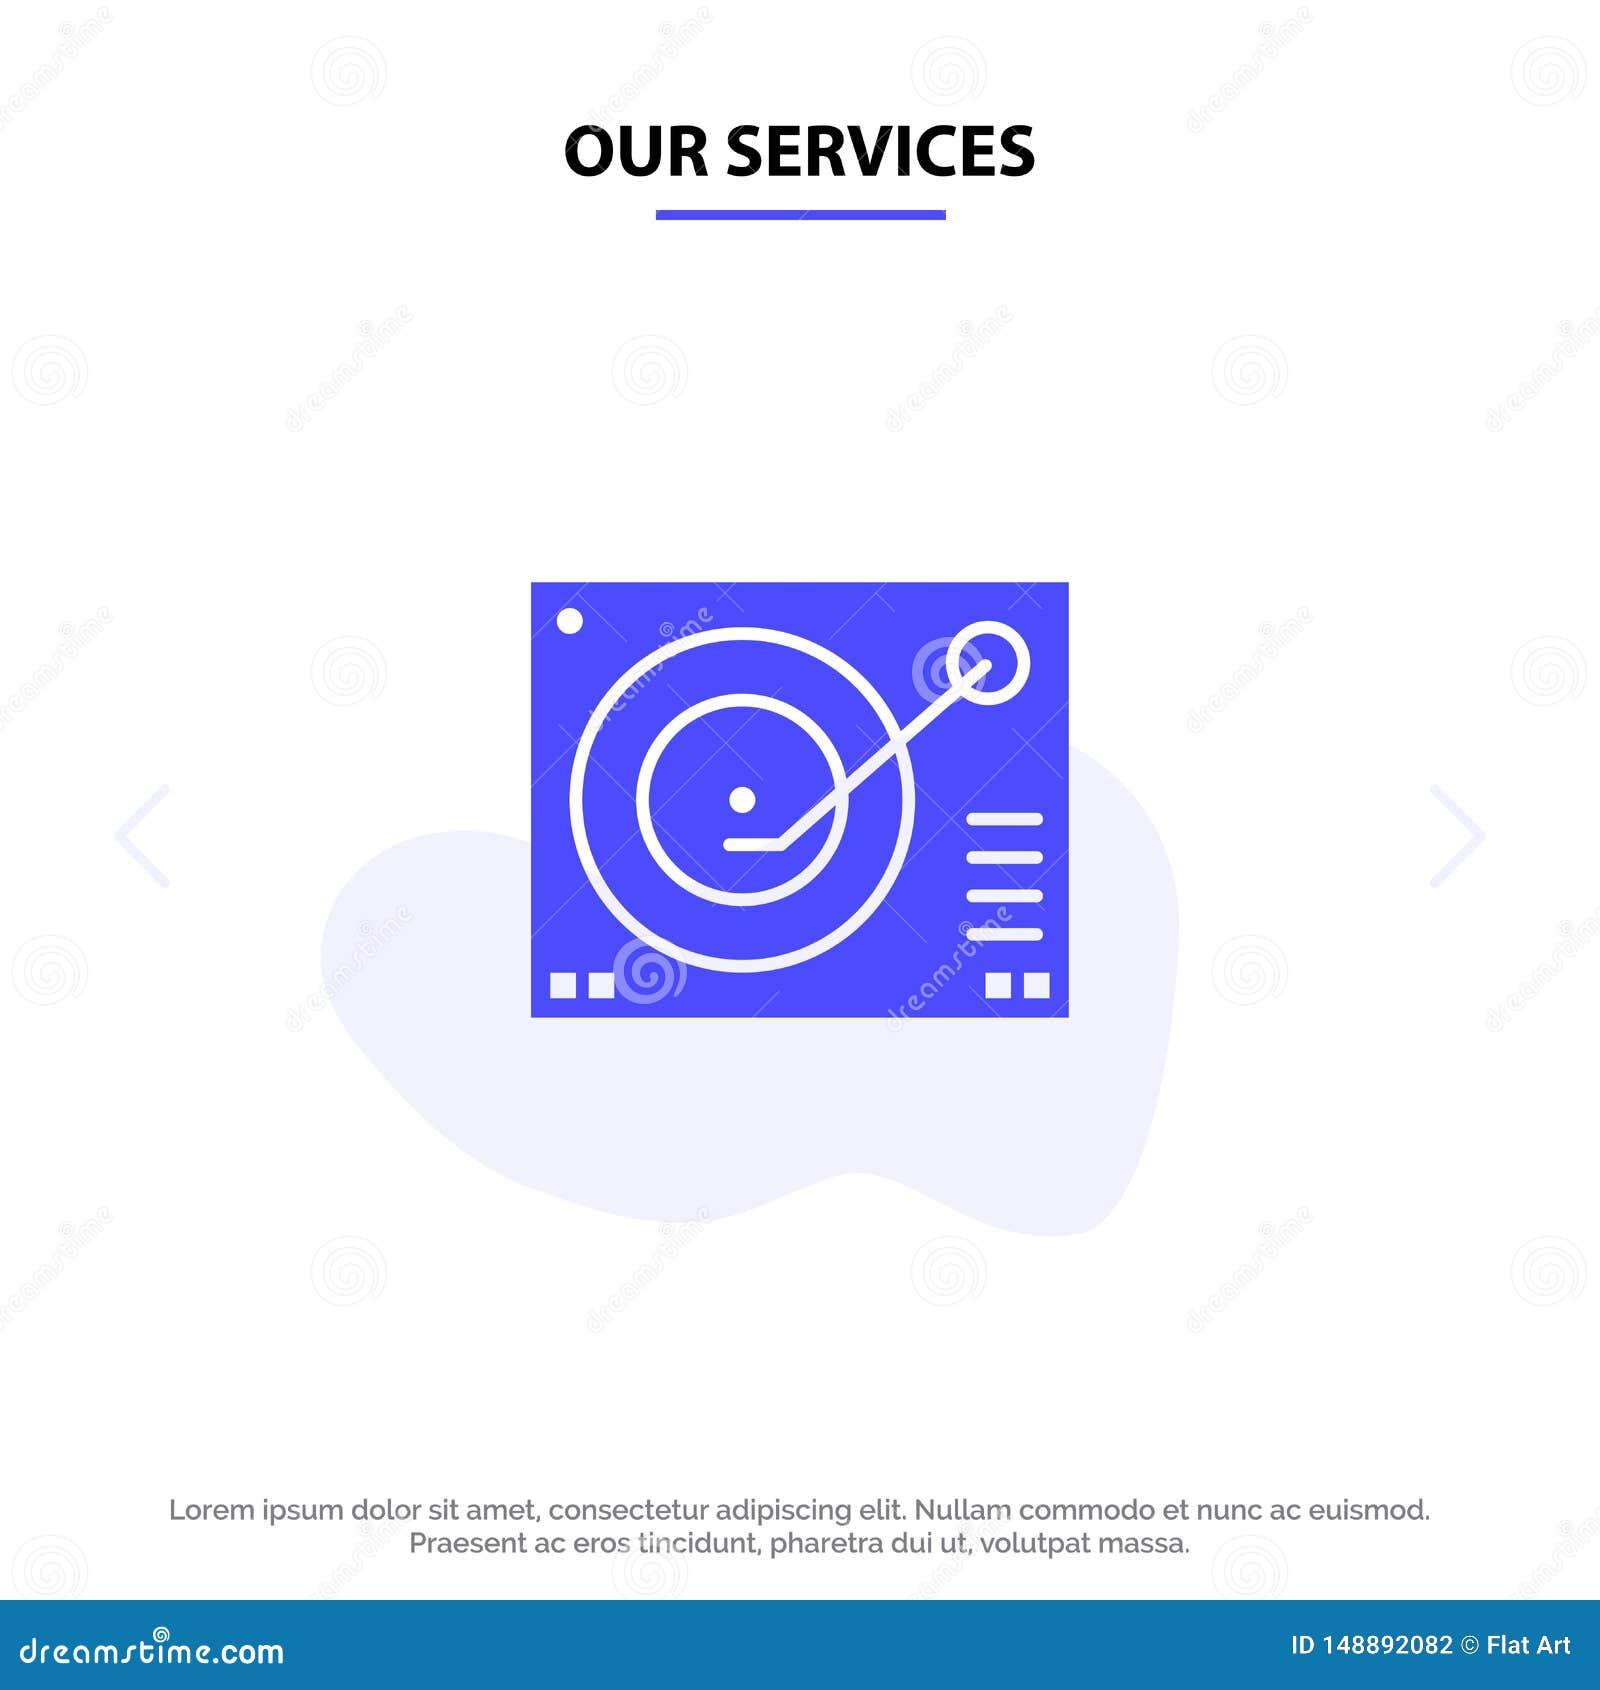 Unsere Service-Plattform, Gerät, Plattenspieler, Spieler, feste Glyph-Ikonen-Netzkarte Rekordschablone